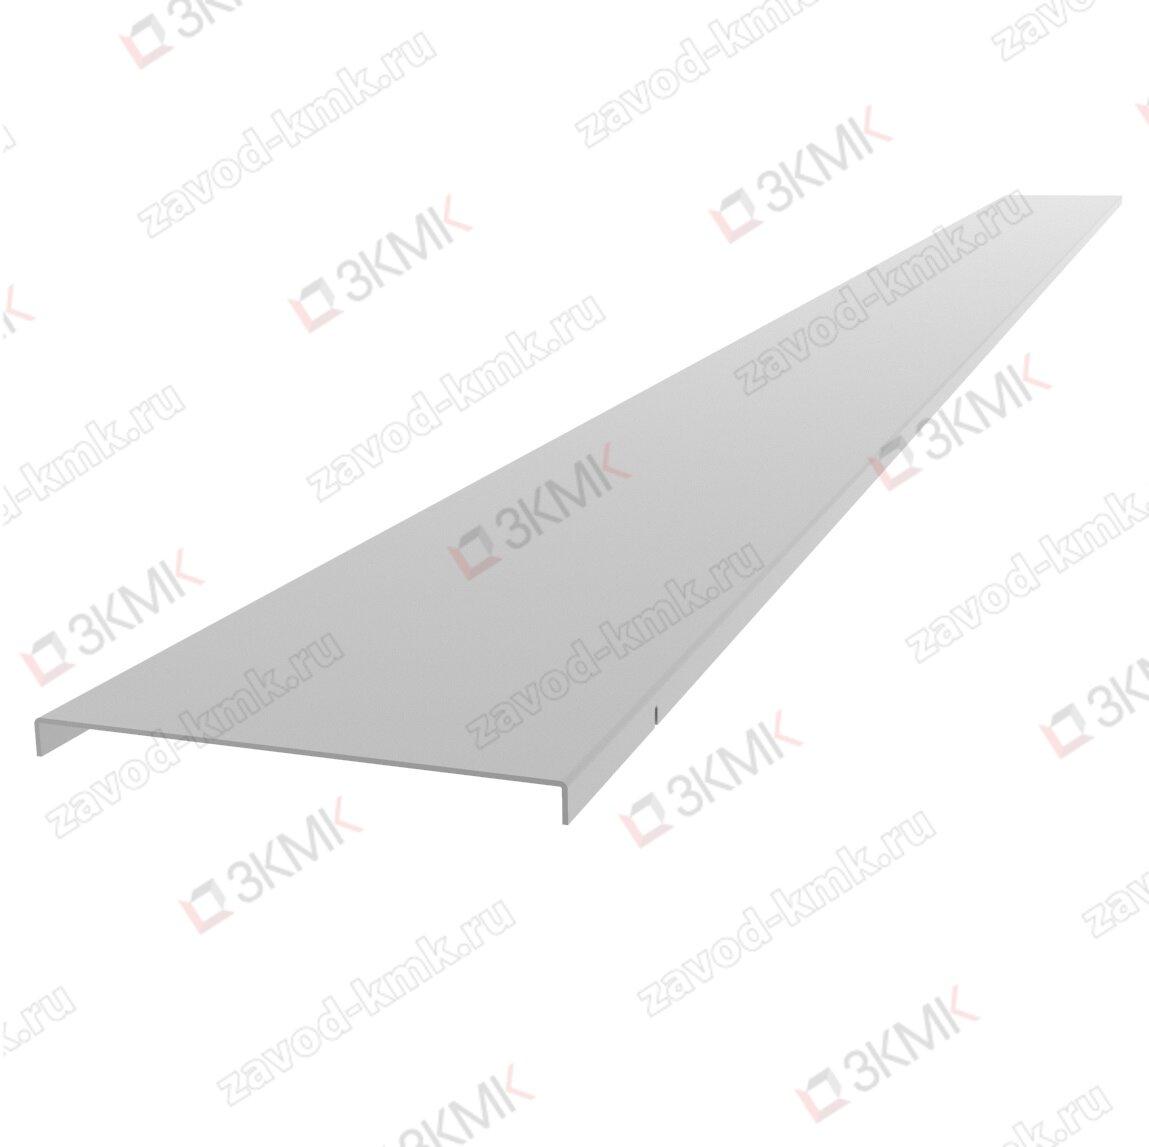 Крышка на лоток тяжелой серии 200 мм длина 2000 мм (1,0 мм) крашенная